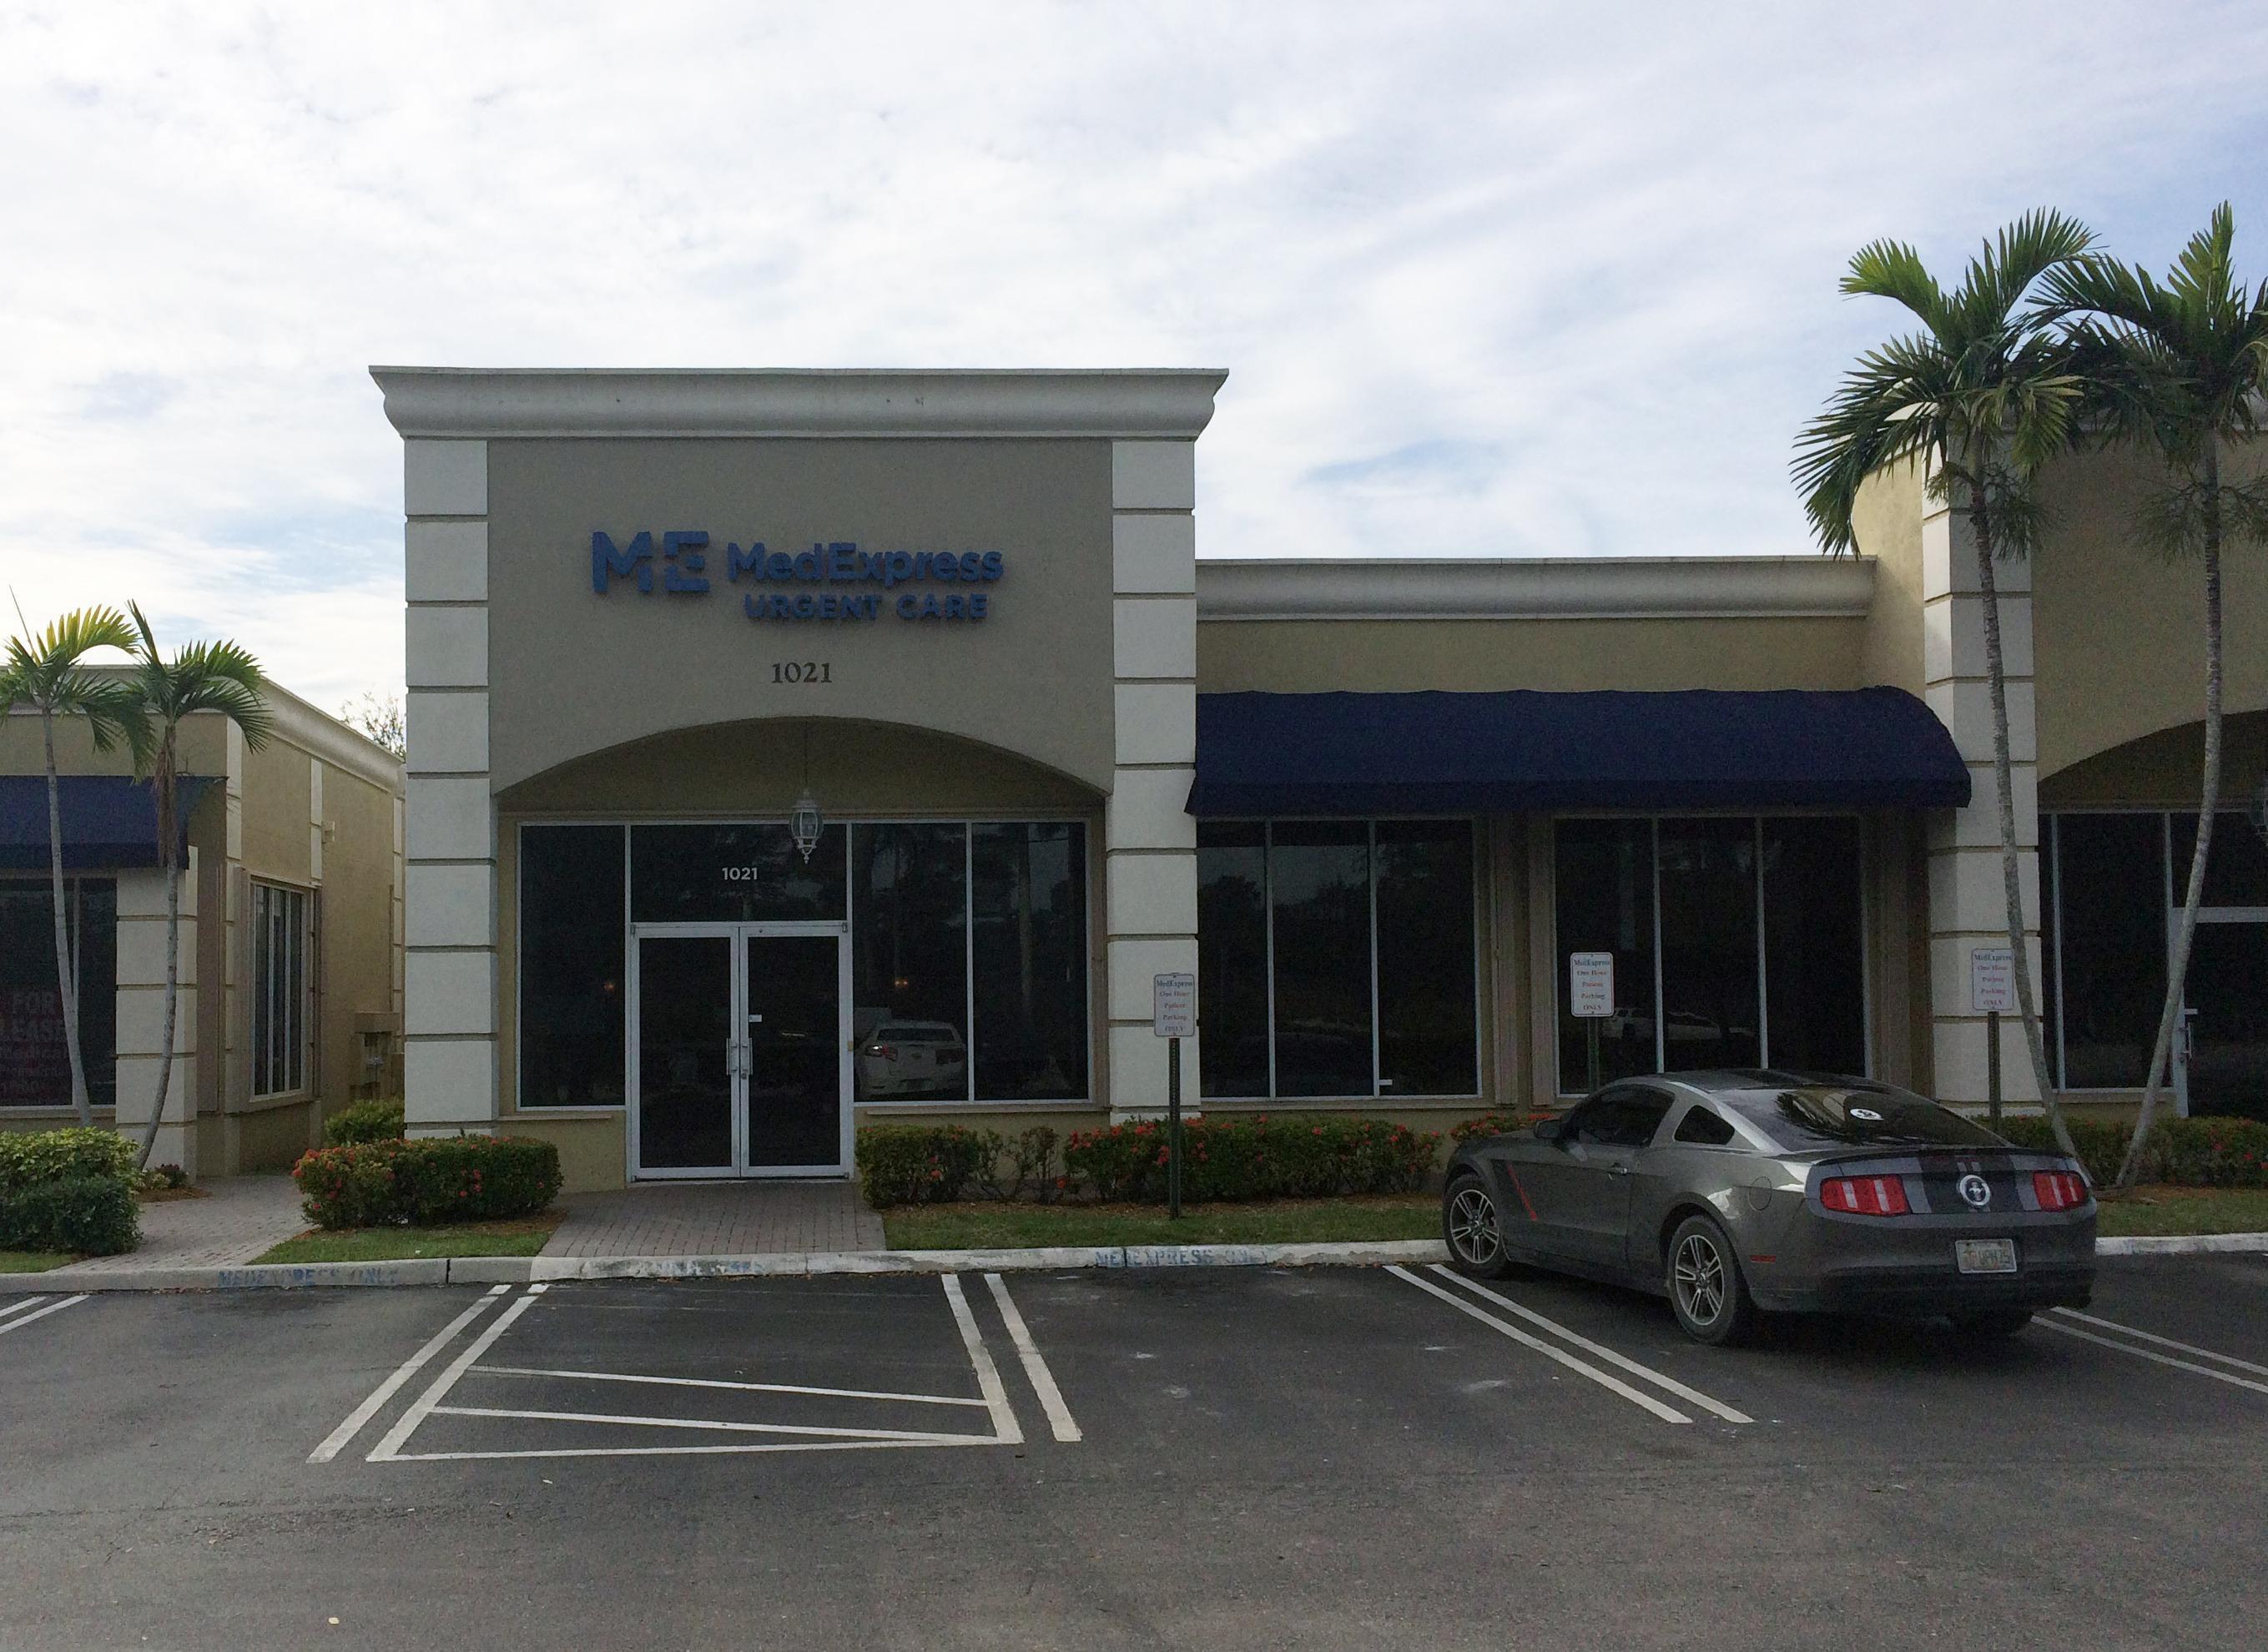 By Photo Congress || Medexpress Urgent Care West Palm Beach Fl